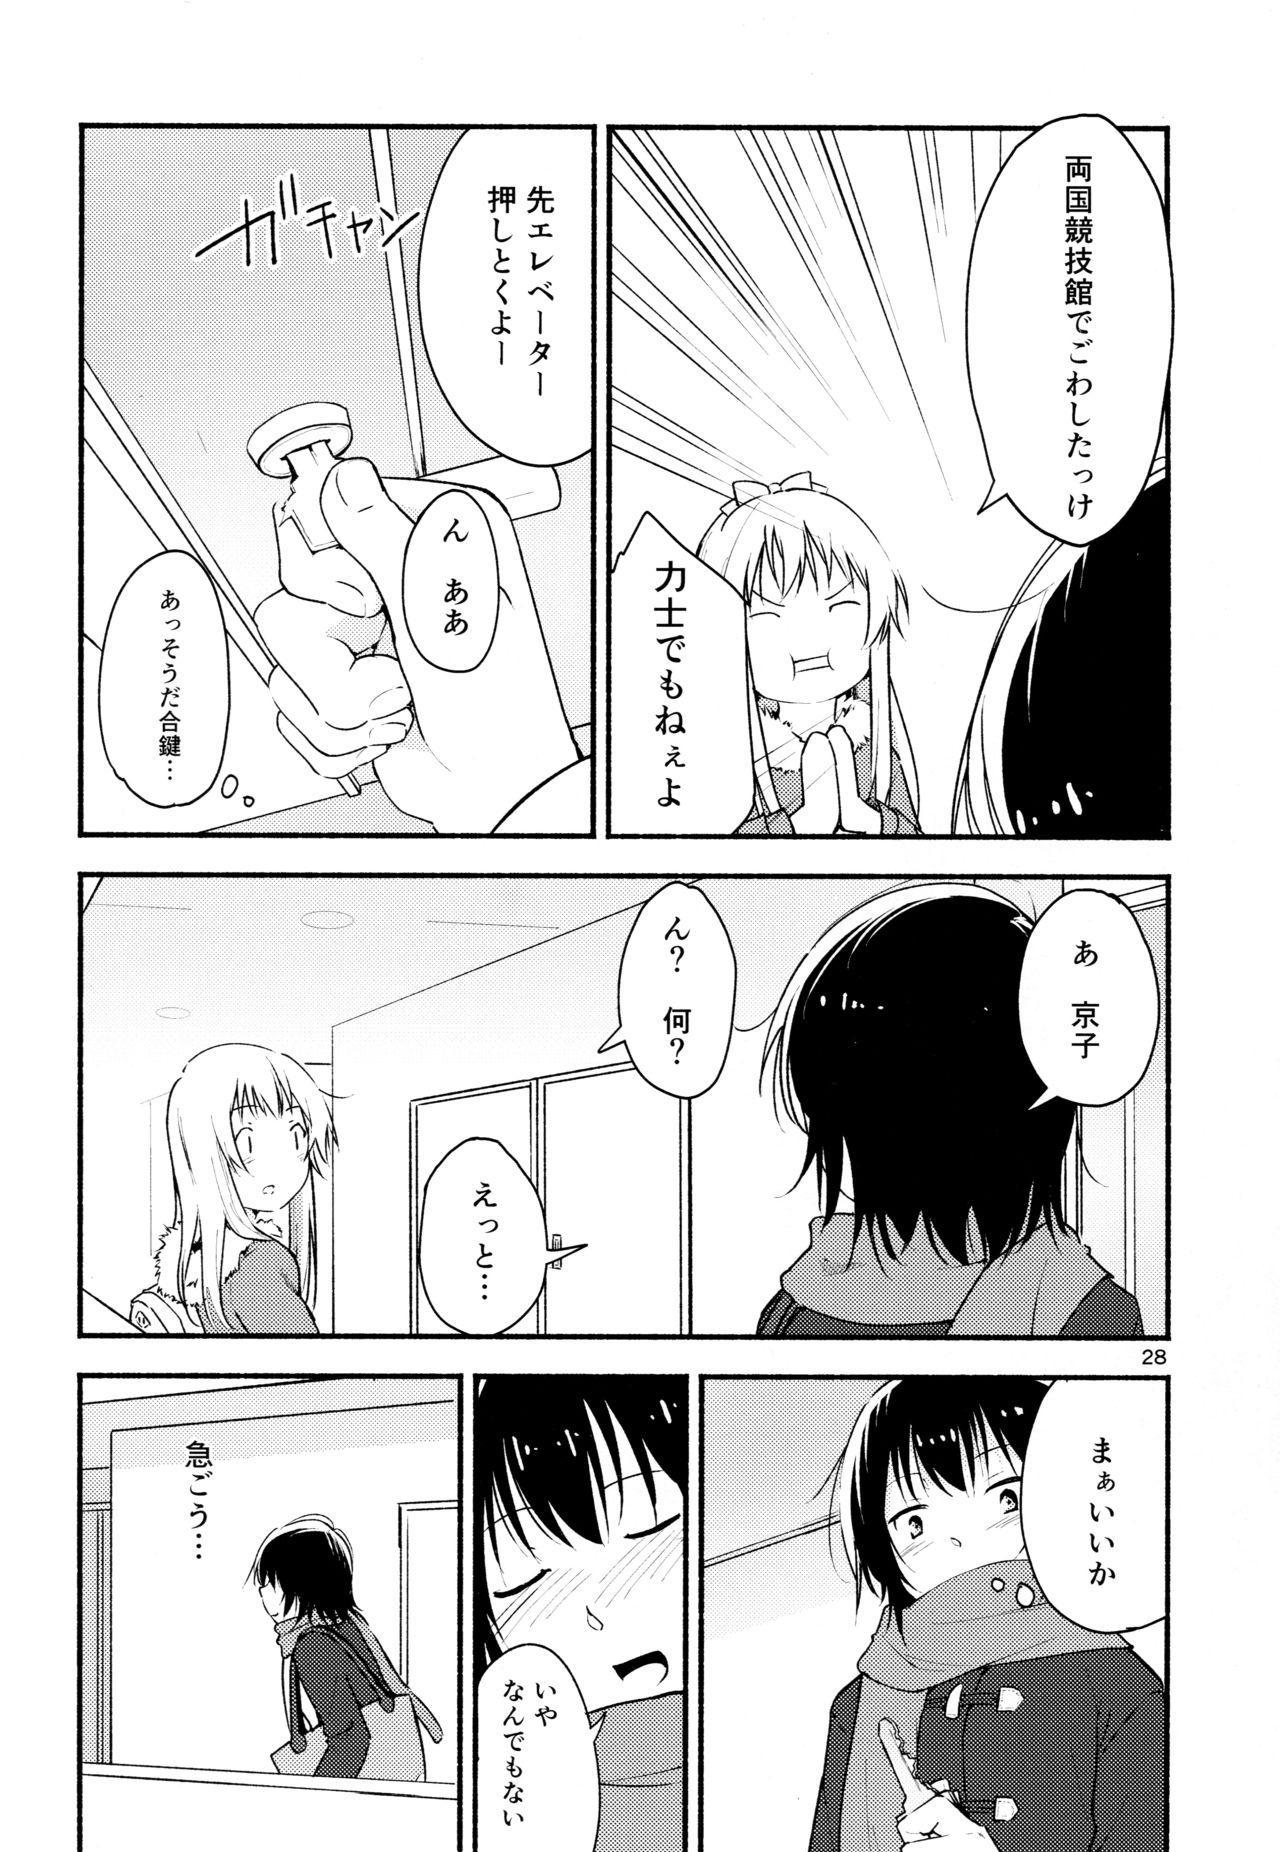 (Girls Love Festival 16) [G-complex (YUI_7)] Kyou mo Ashita mo Yurui Hibi o - Yui and Kyoko and forever loose day-to-day (YuruYuri) 26